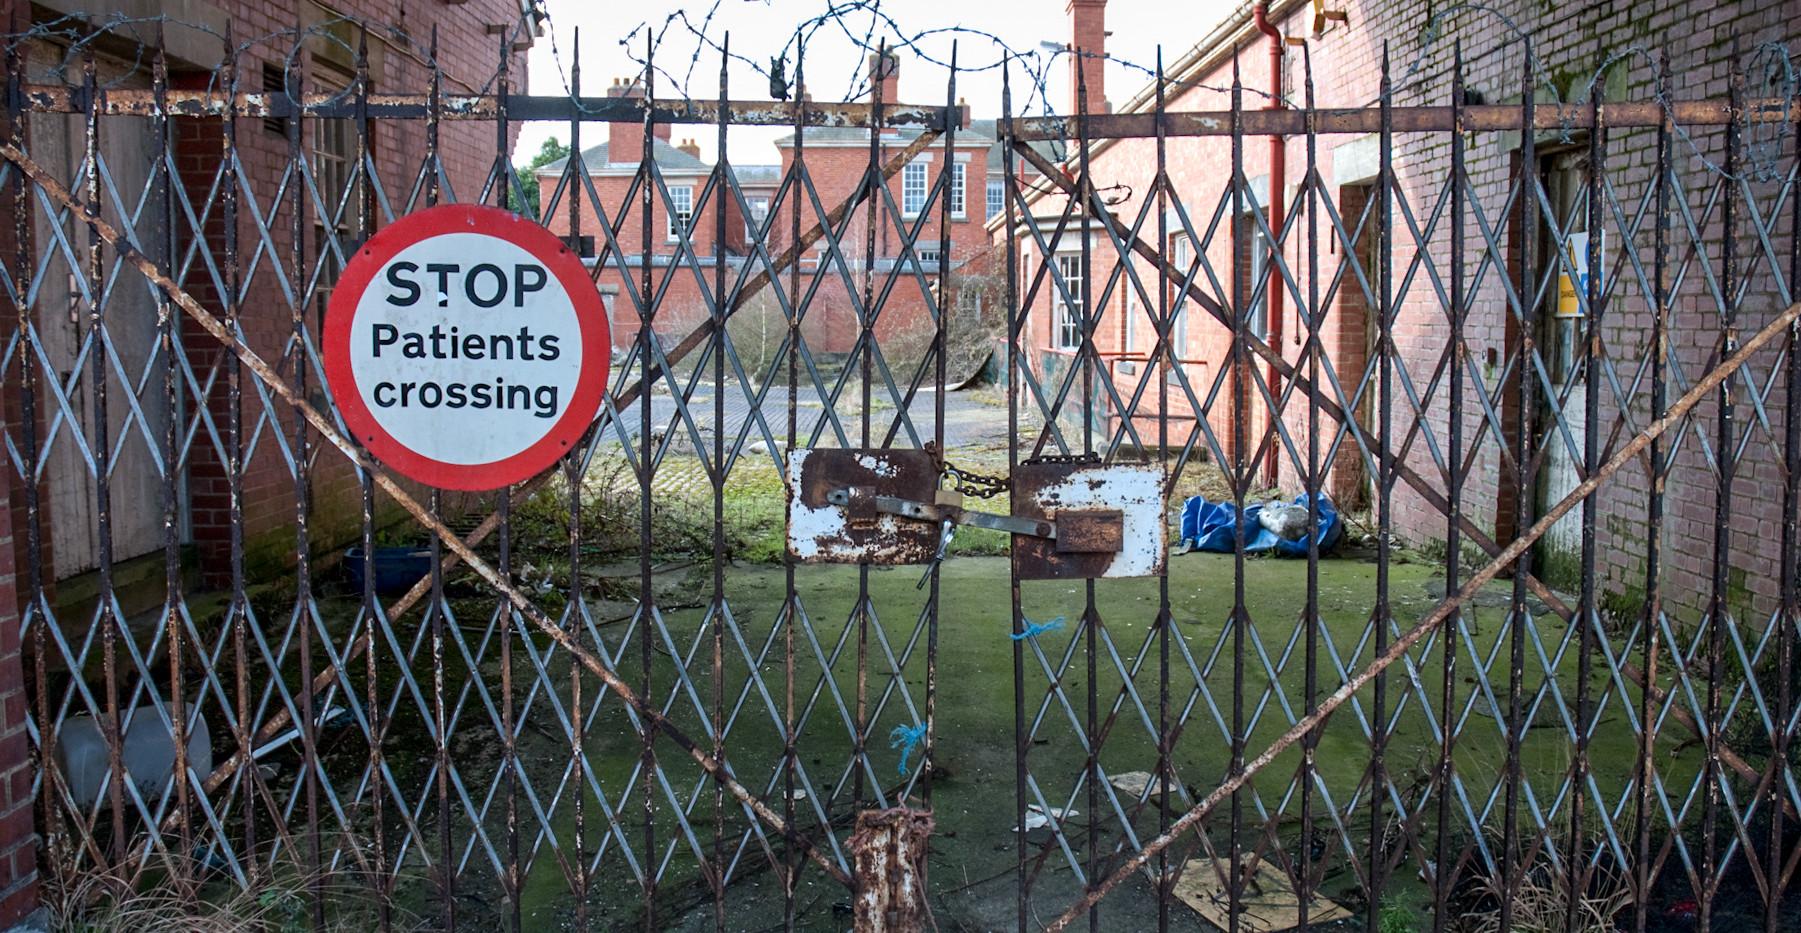 AbandonedHospitals-2.jpg